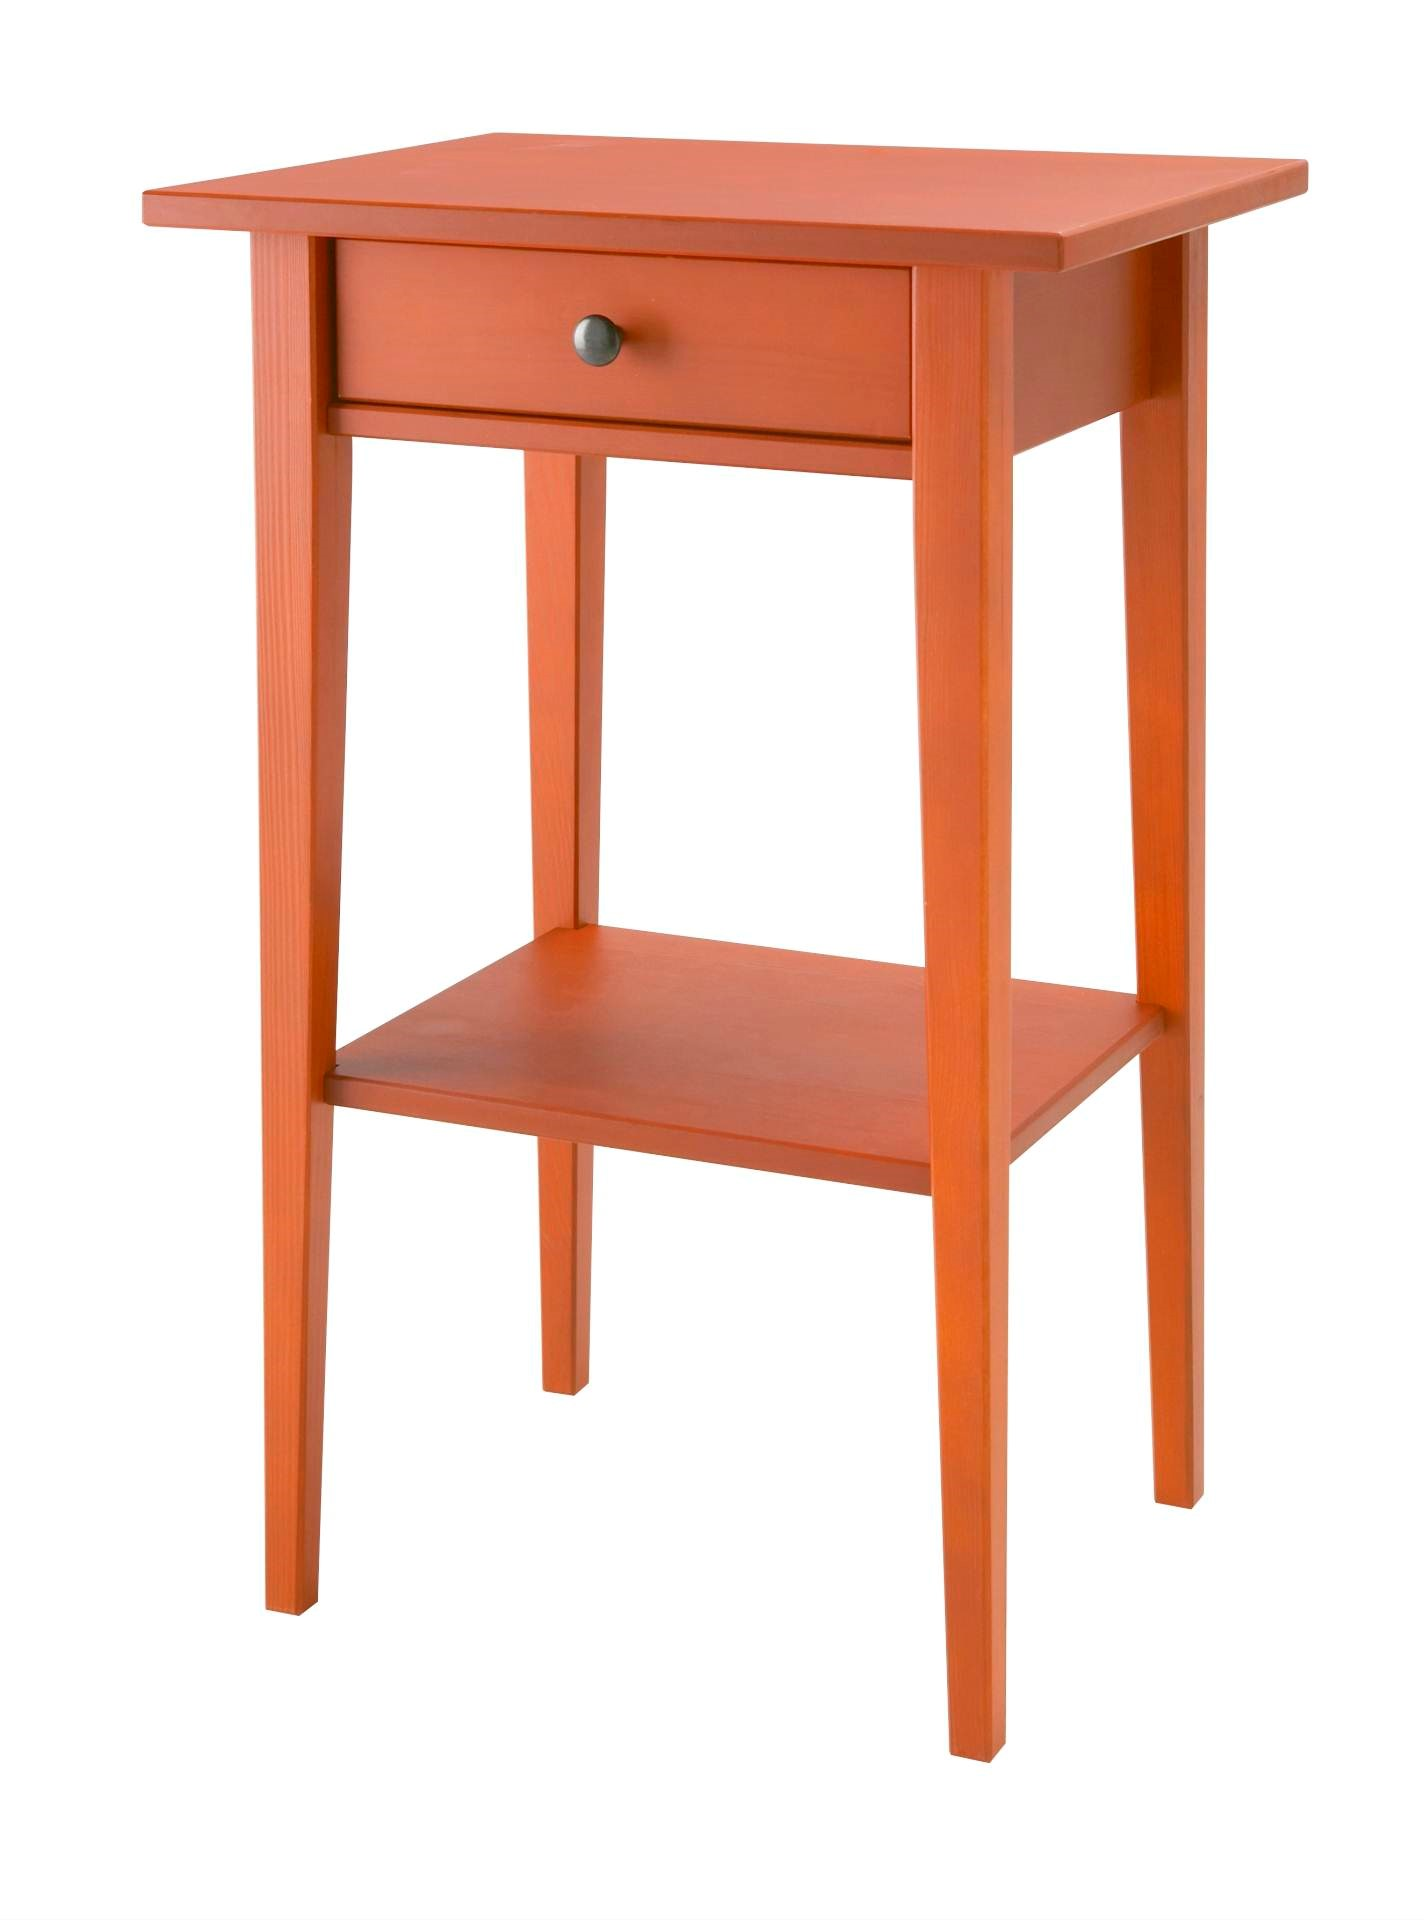 HEMNES紅色床邊桌_原價$1,995/特價$995  圖片提供_IKEA